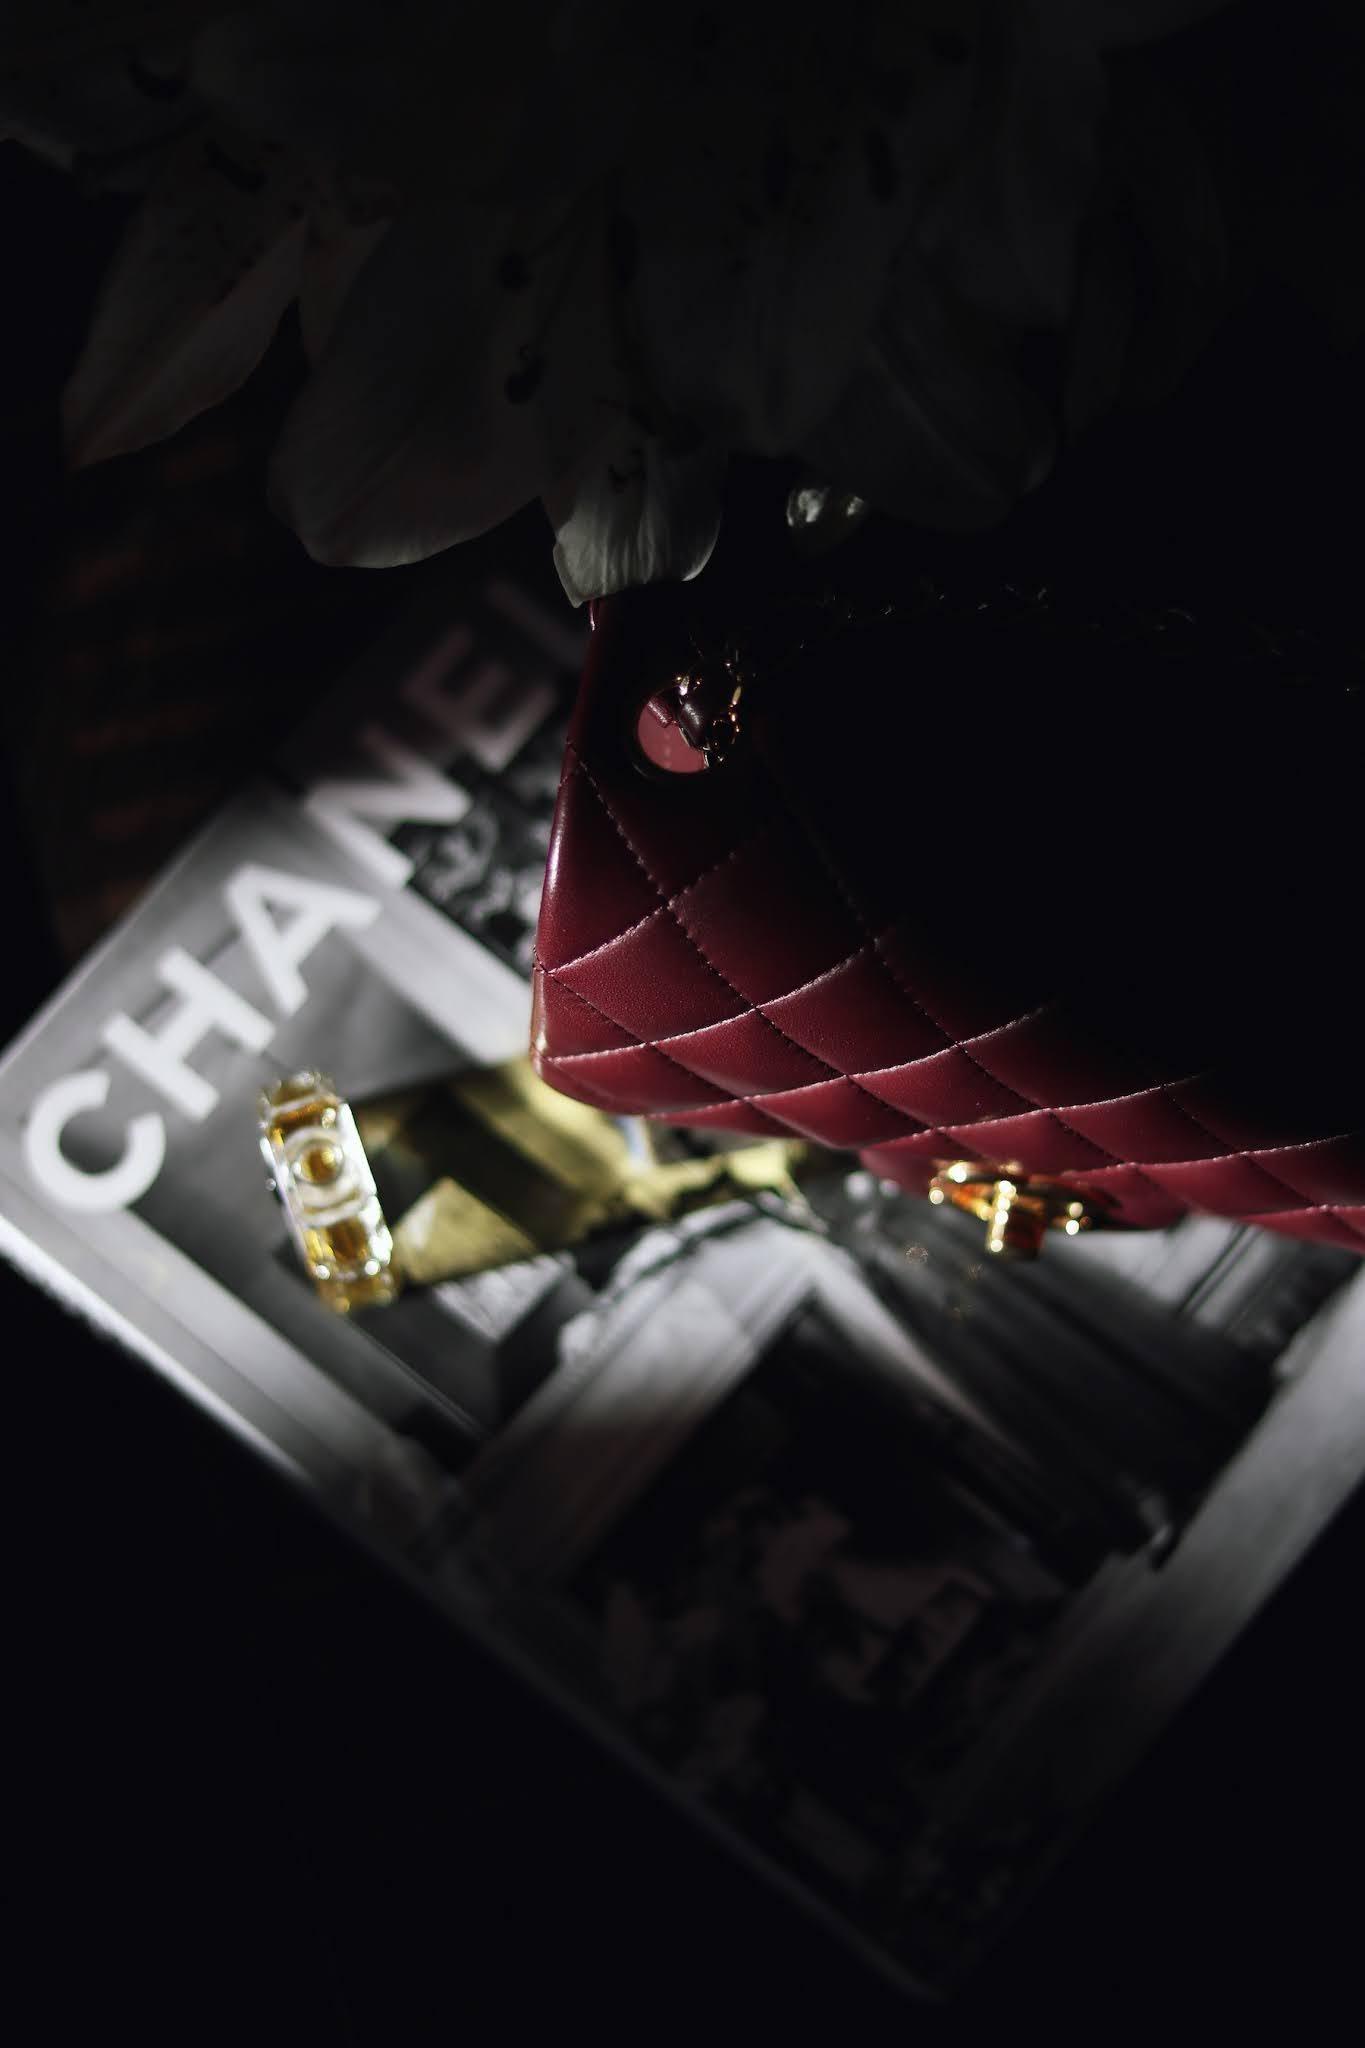 Chanel No5 fragrance 100 year anniversary